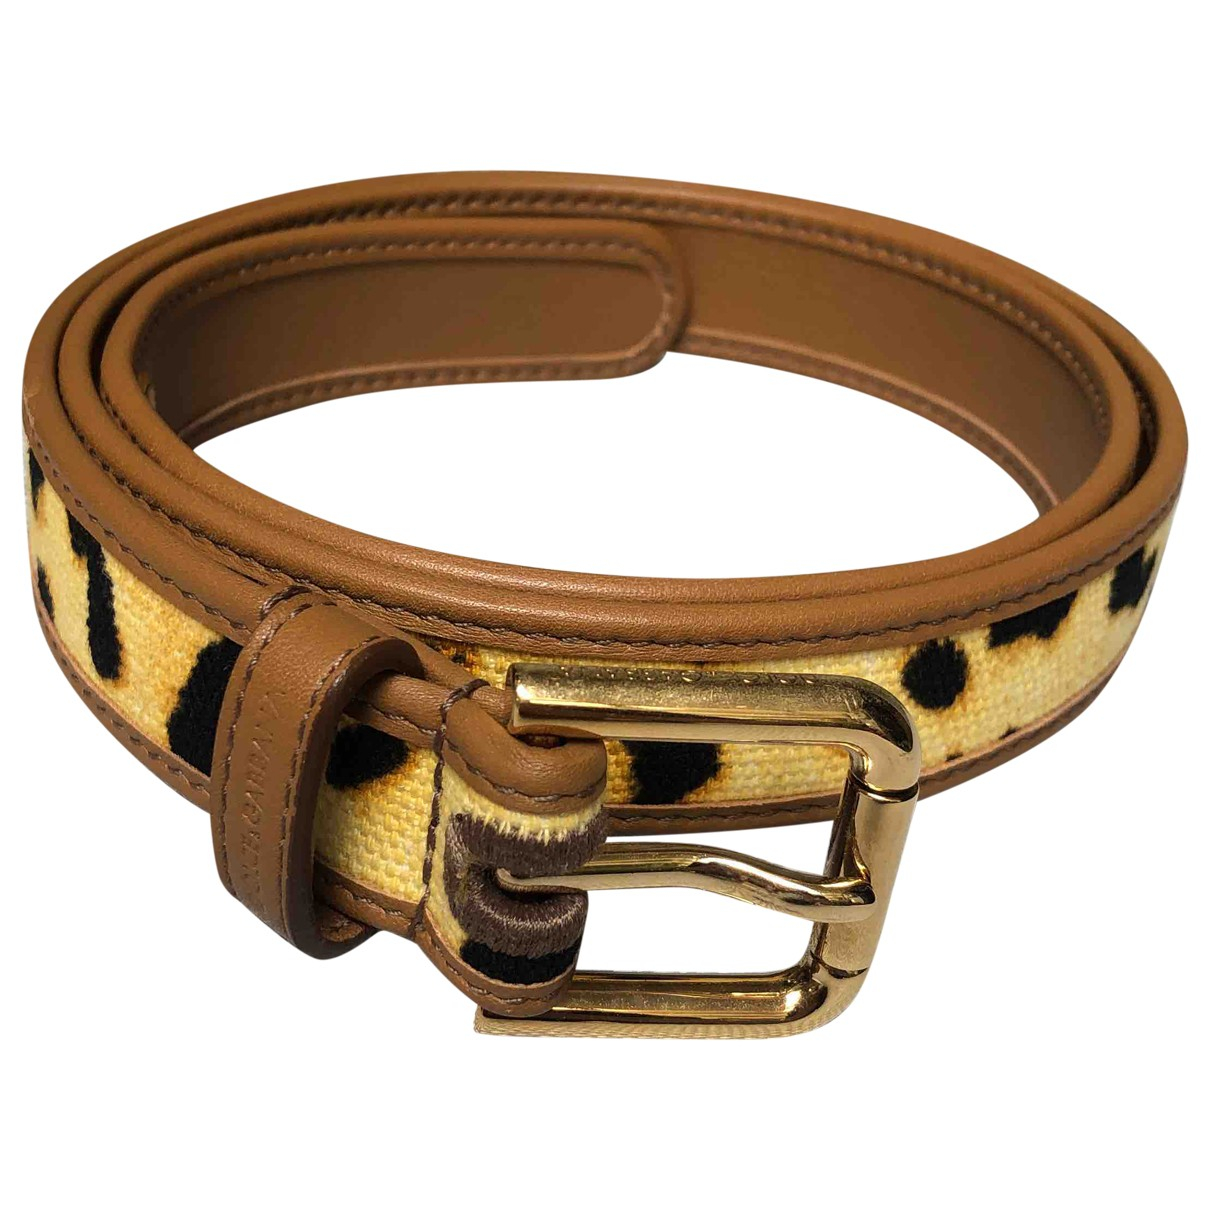 Dolce & Gabbana N Brown Leather belt for Women 85 cm